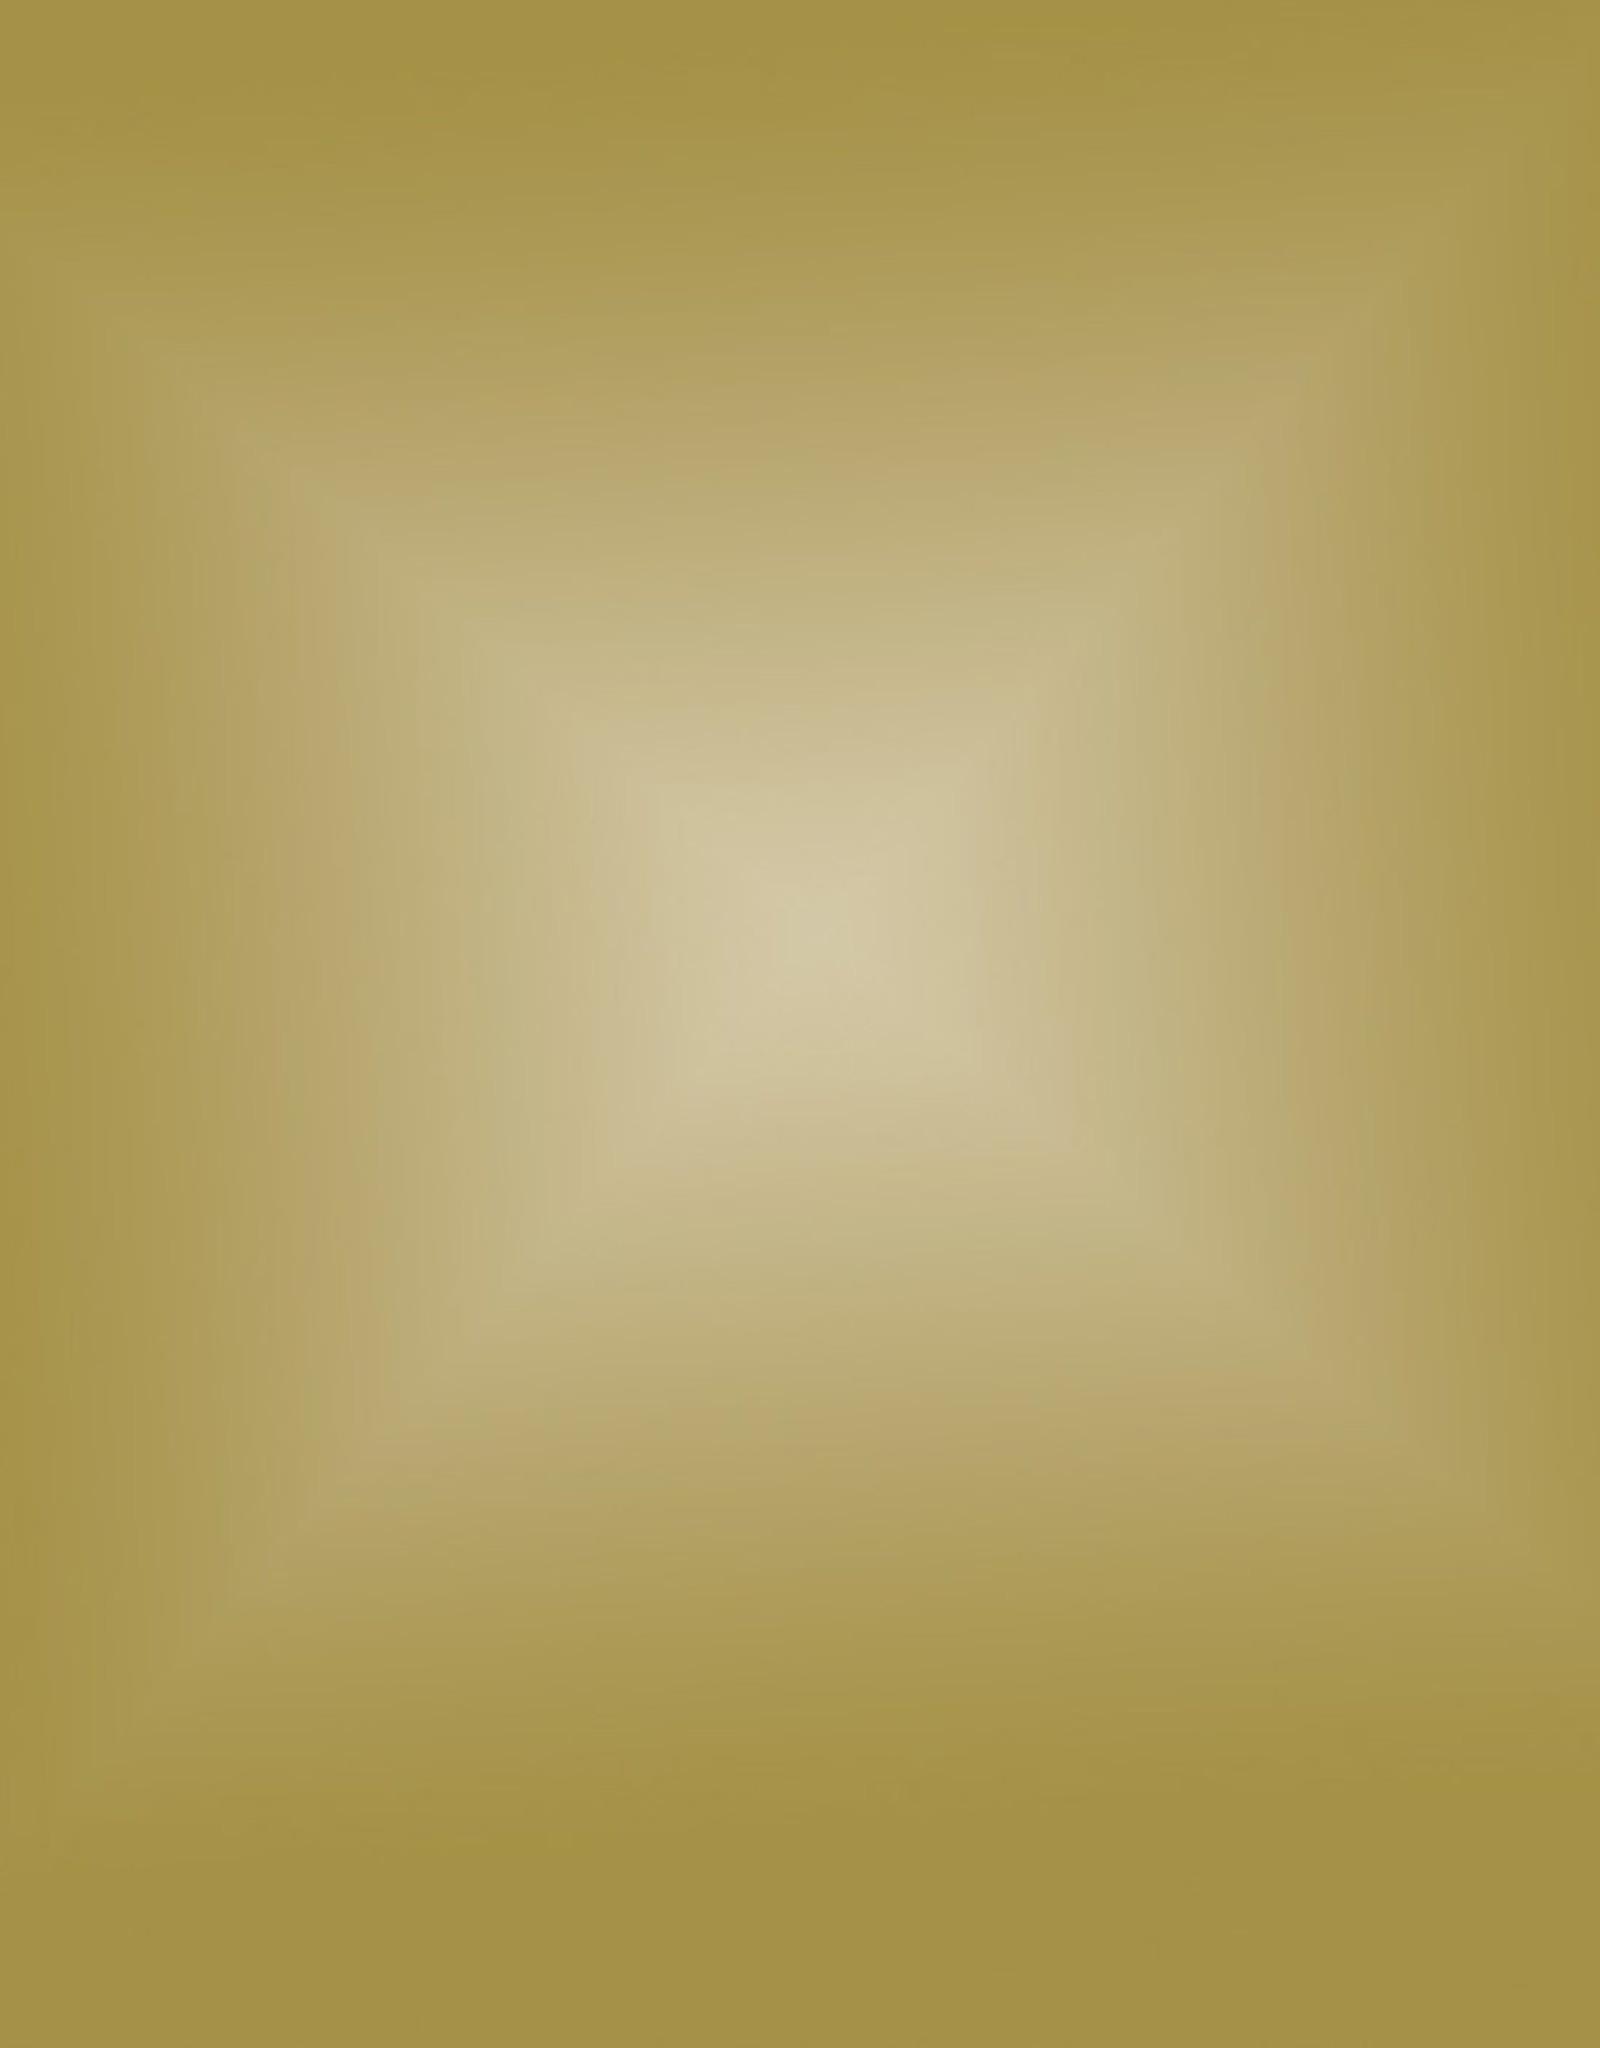 Siser flexfolie antiek goud 20